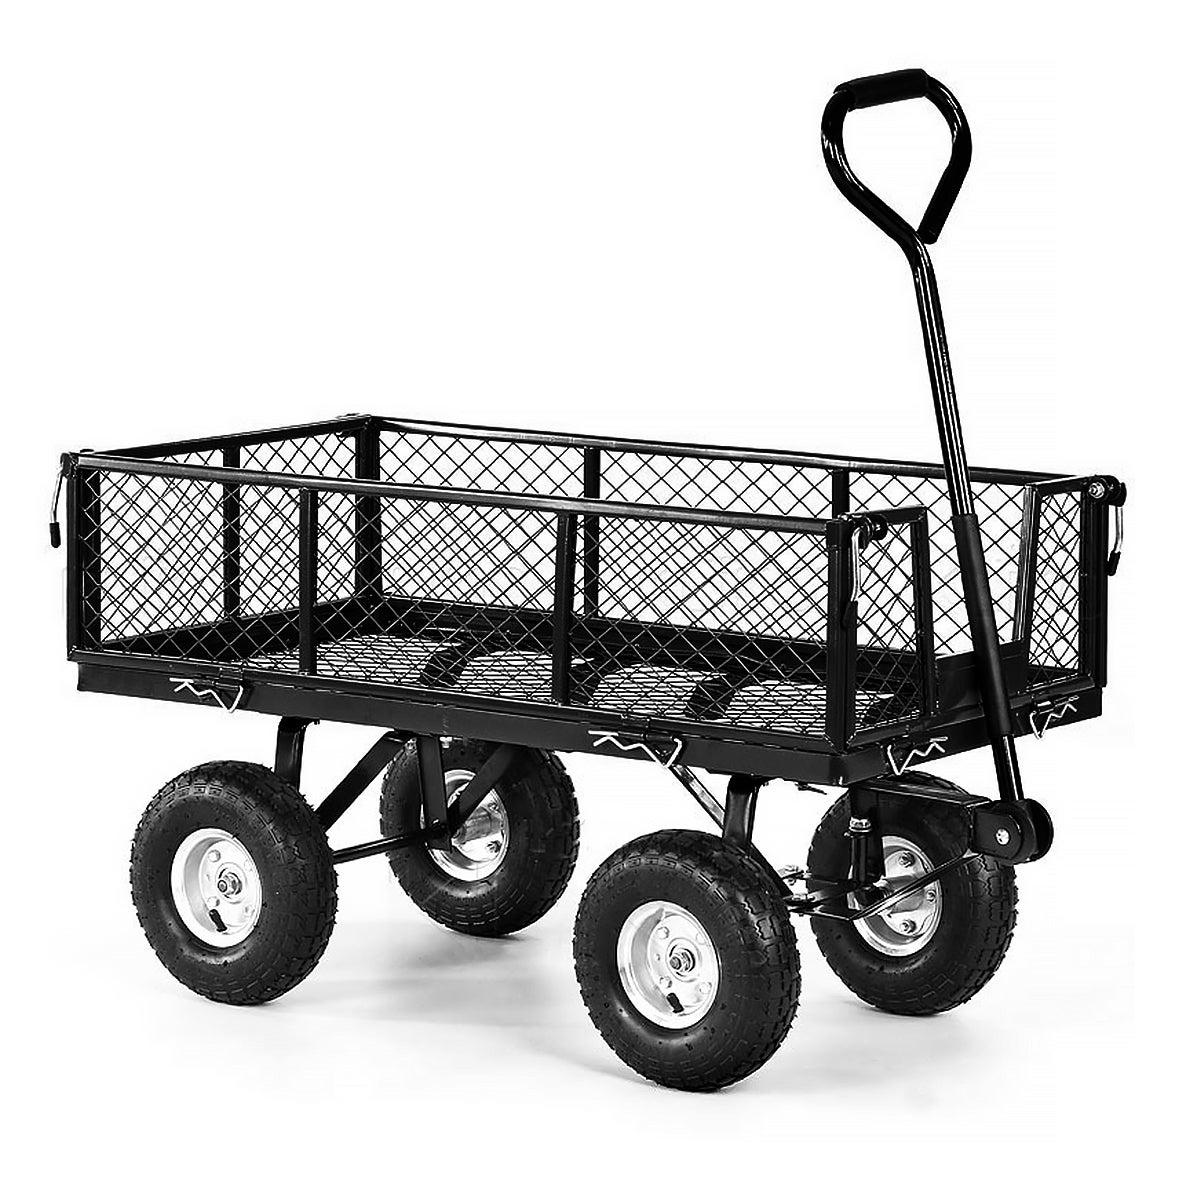 Heavy Duty Folding Garden Trolley Rust Free Cart Hand Utility Lawn- Black